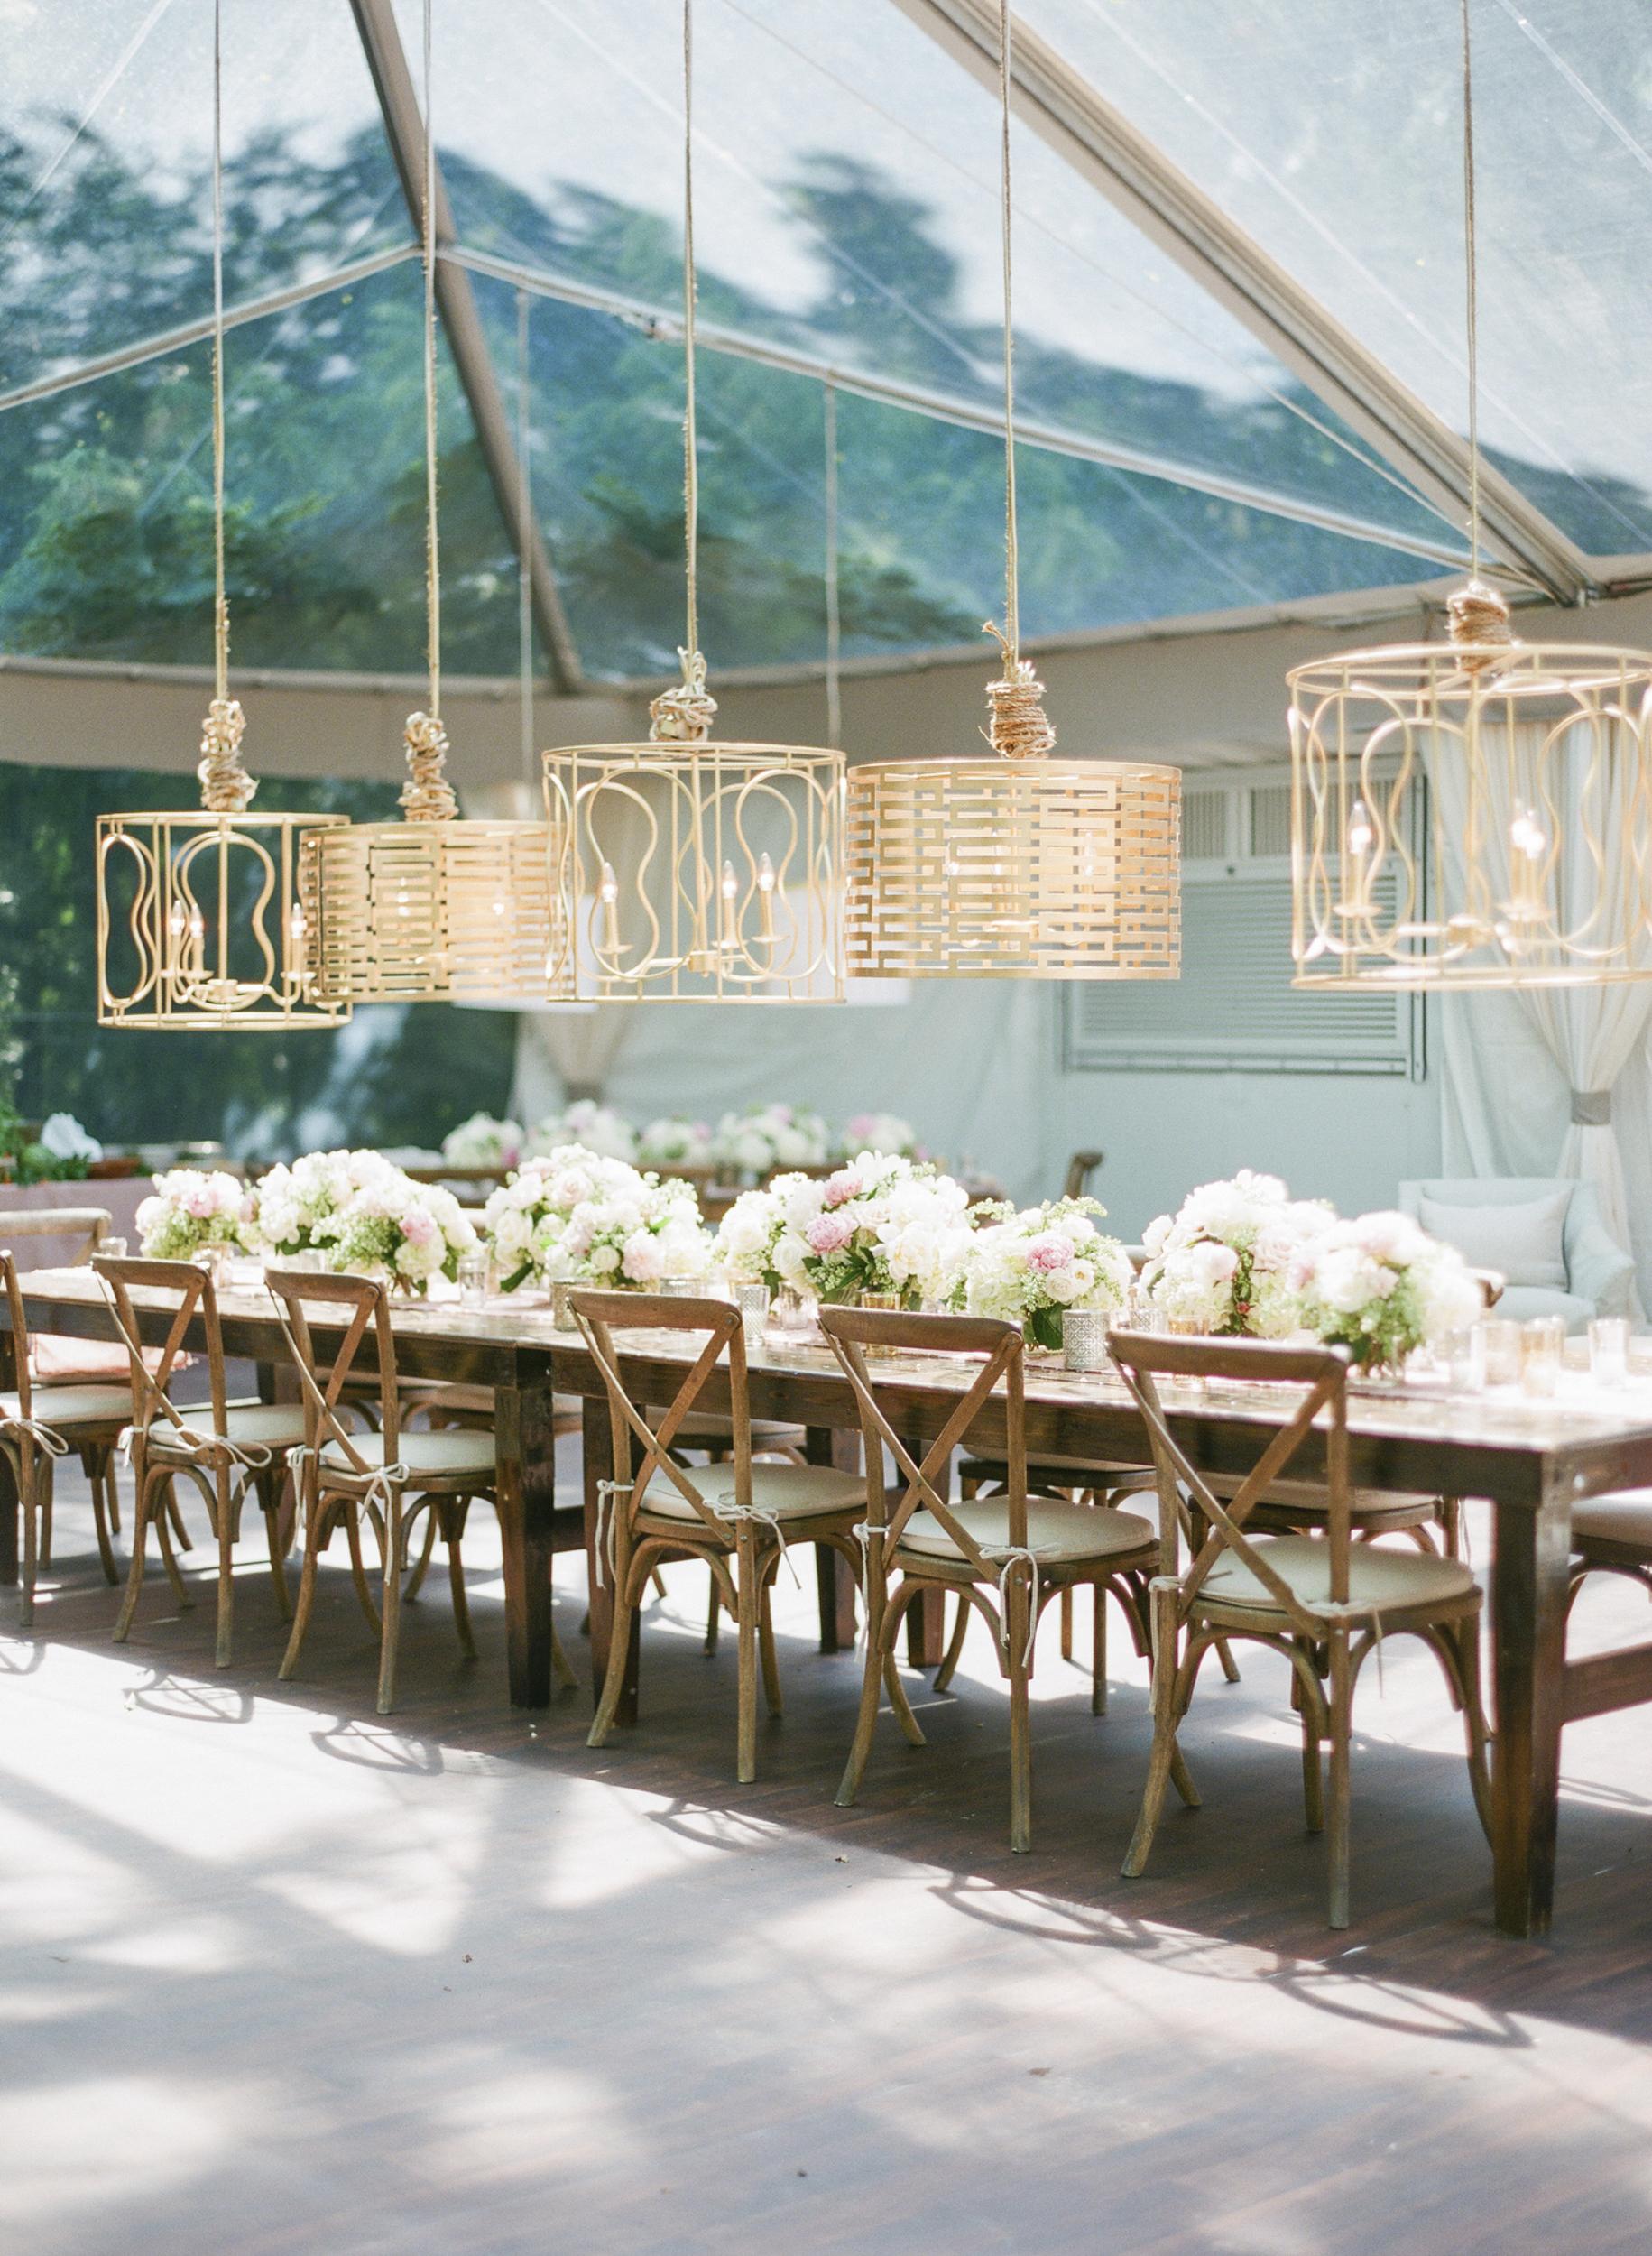 south_carolina_farm_wedding_rustic_chic_surprise_secret_luxe_wedding_bachelorette_emily_maynard_real_weddings-18.jpg